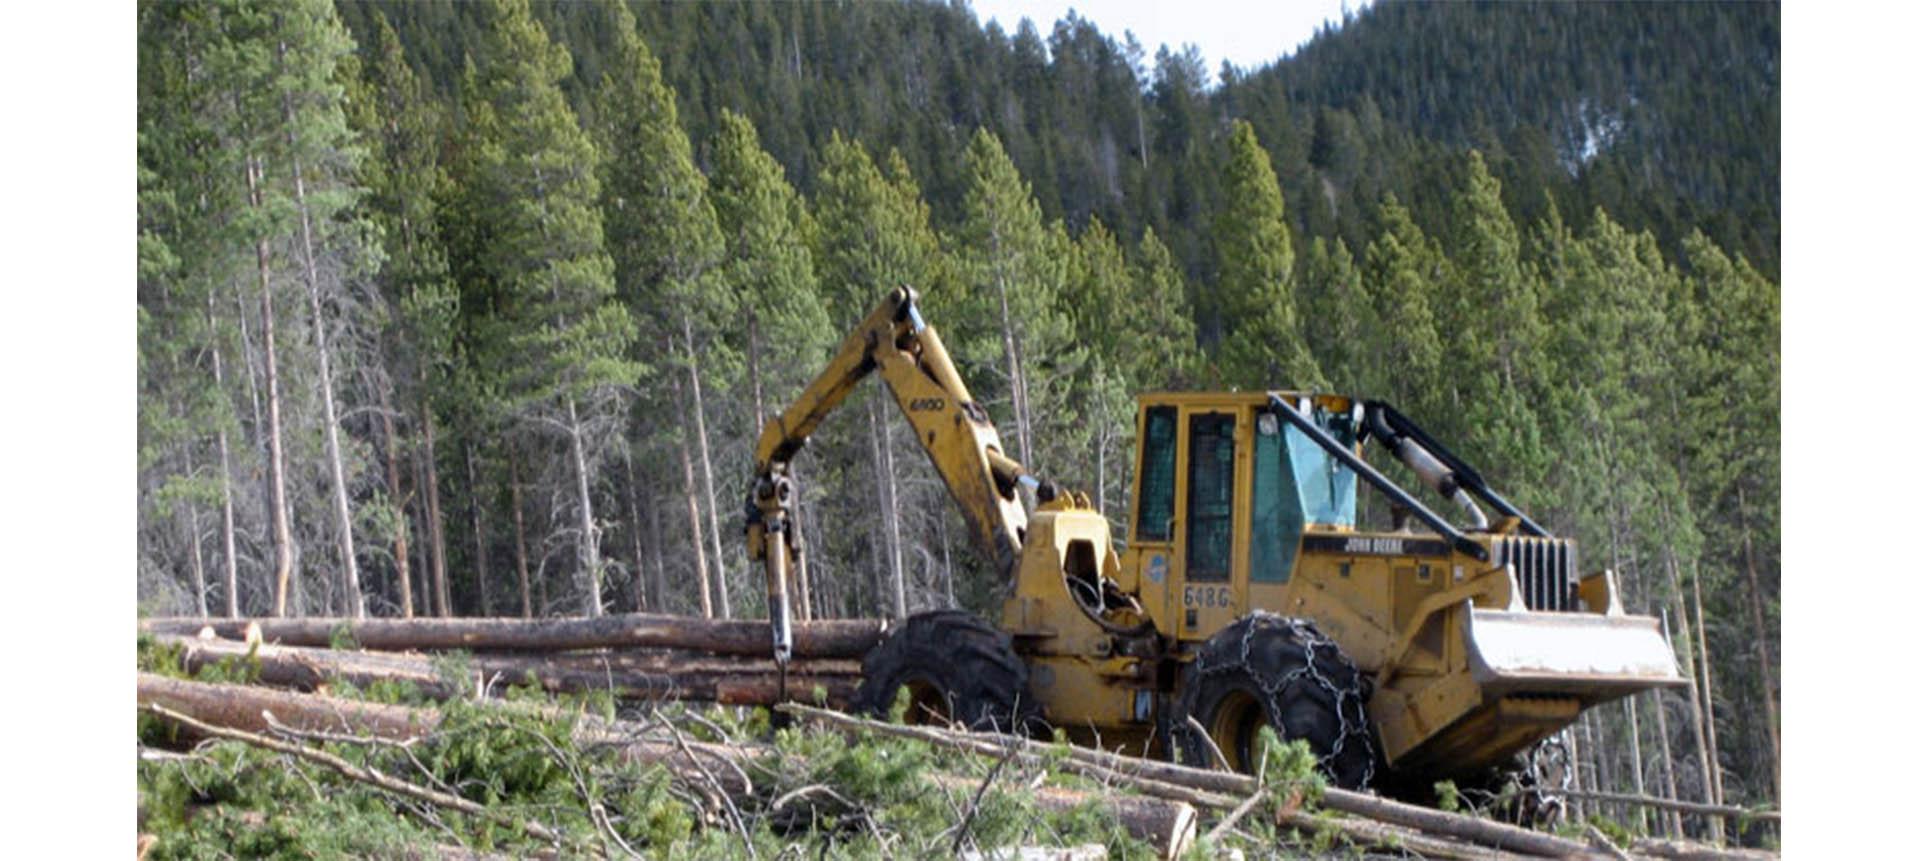 ForestryMulcher